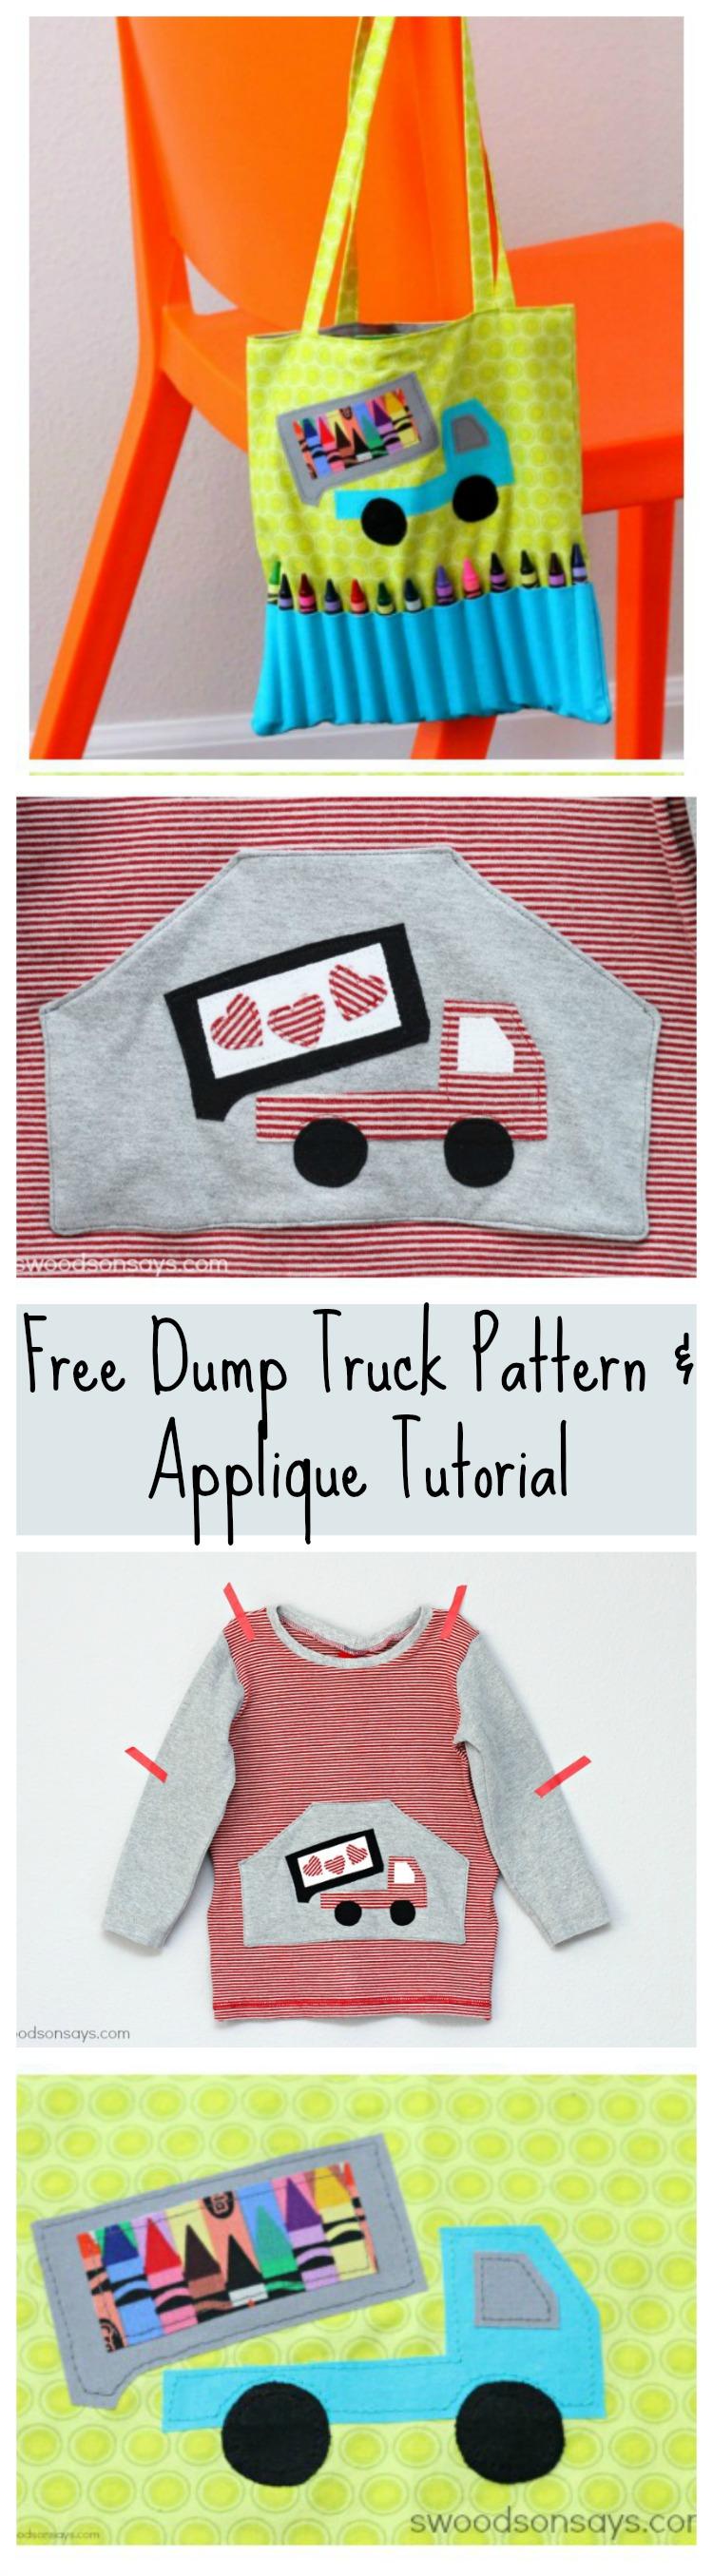 Free Dump Truck Applique